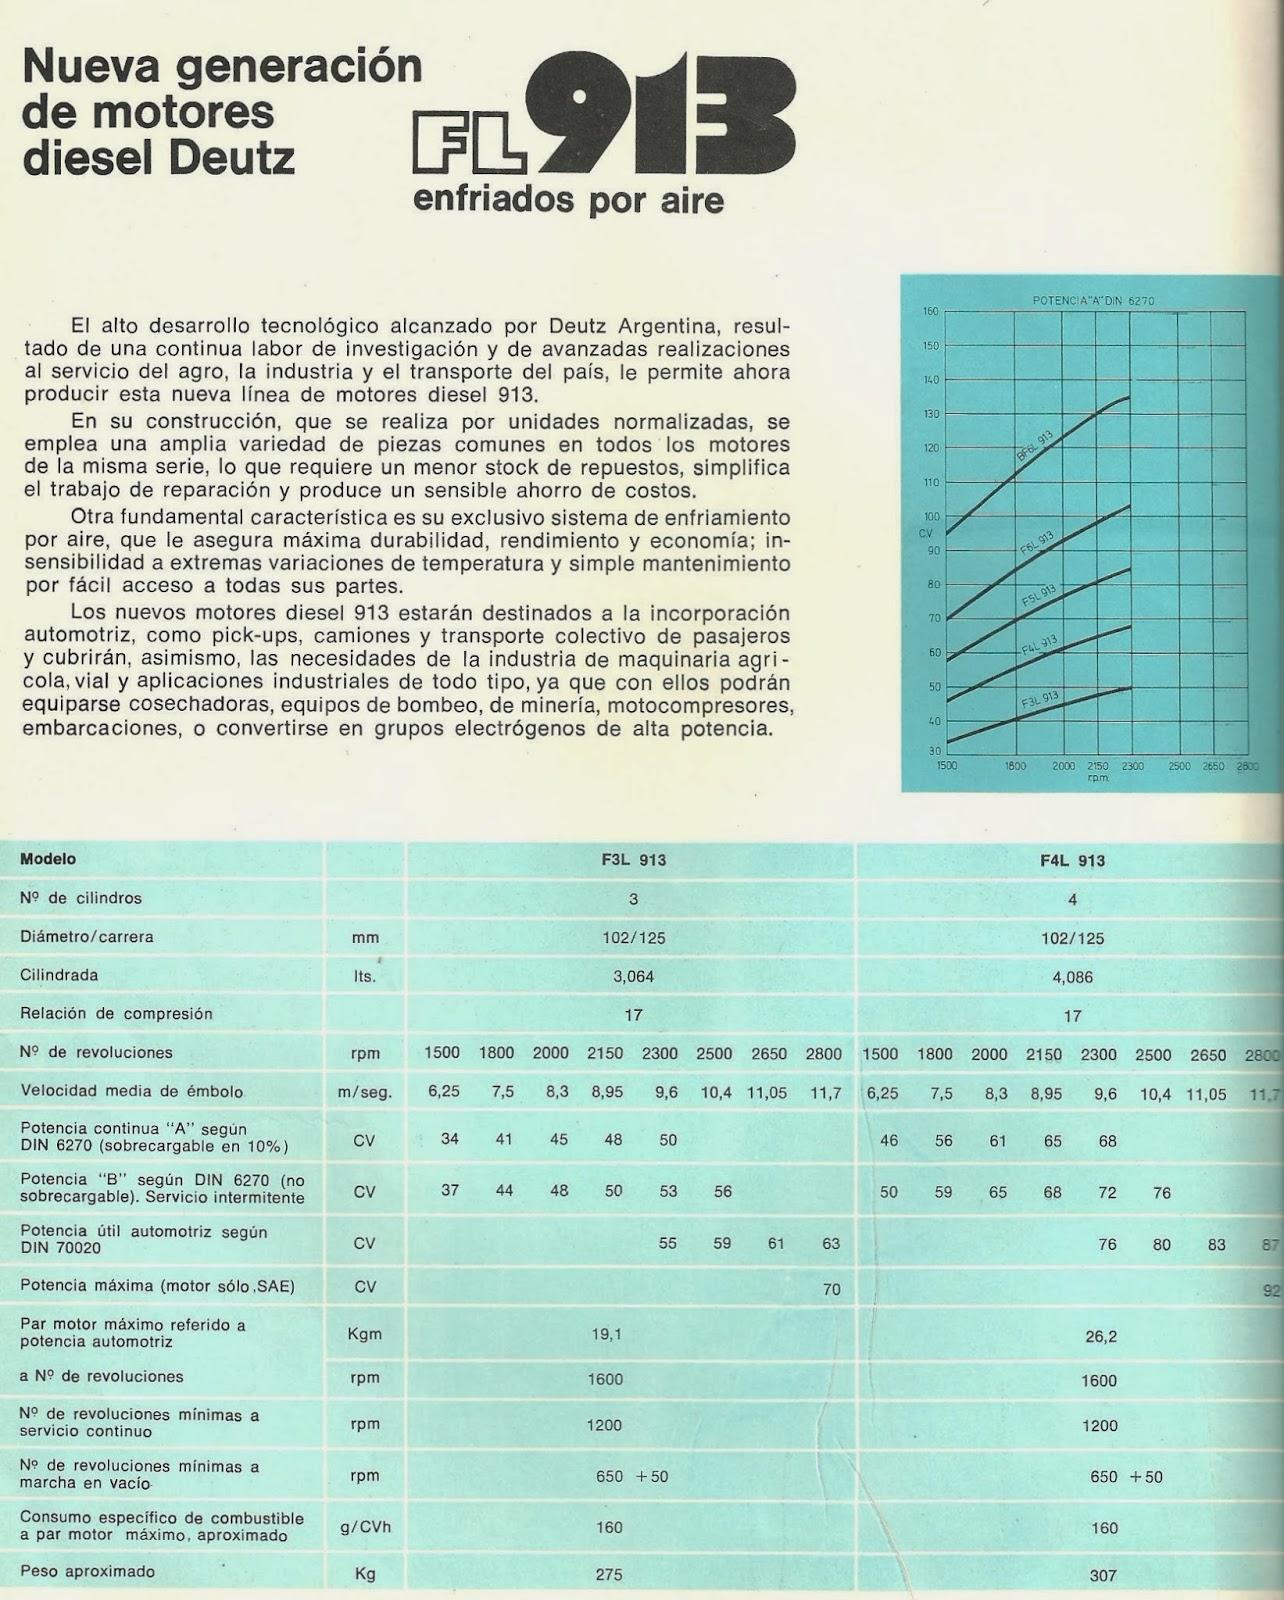 deutz 1011f engine manual tractor truck shop repair service manual cd Array  - cami n argentino documentos motores deutz serie 913 rh camionargentino ...